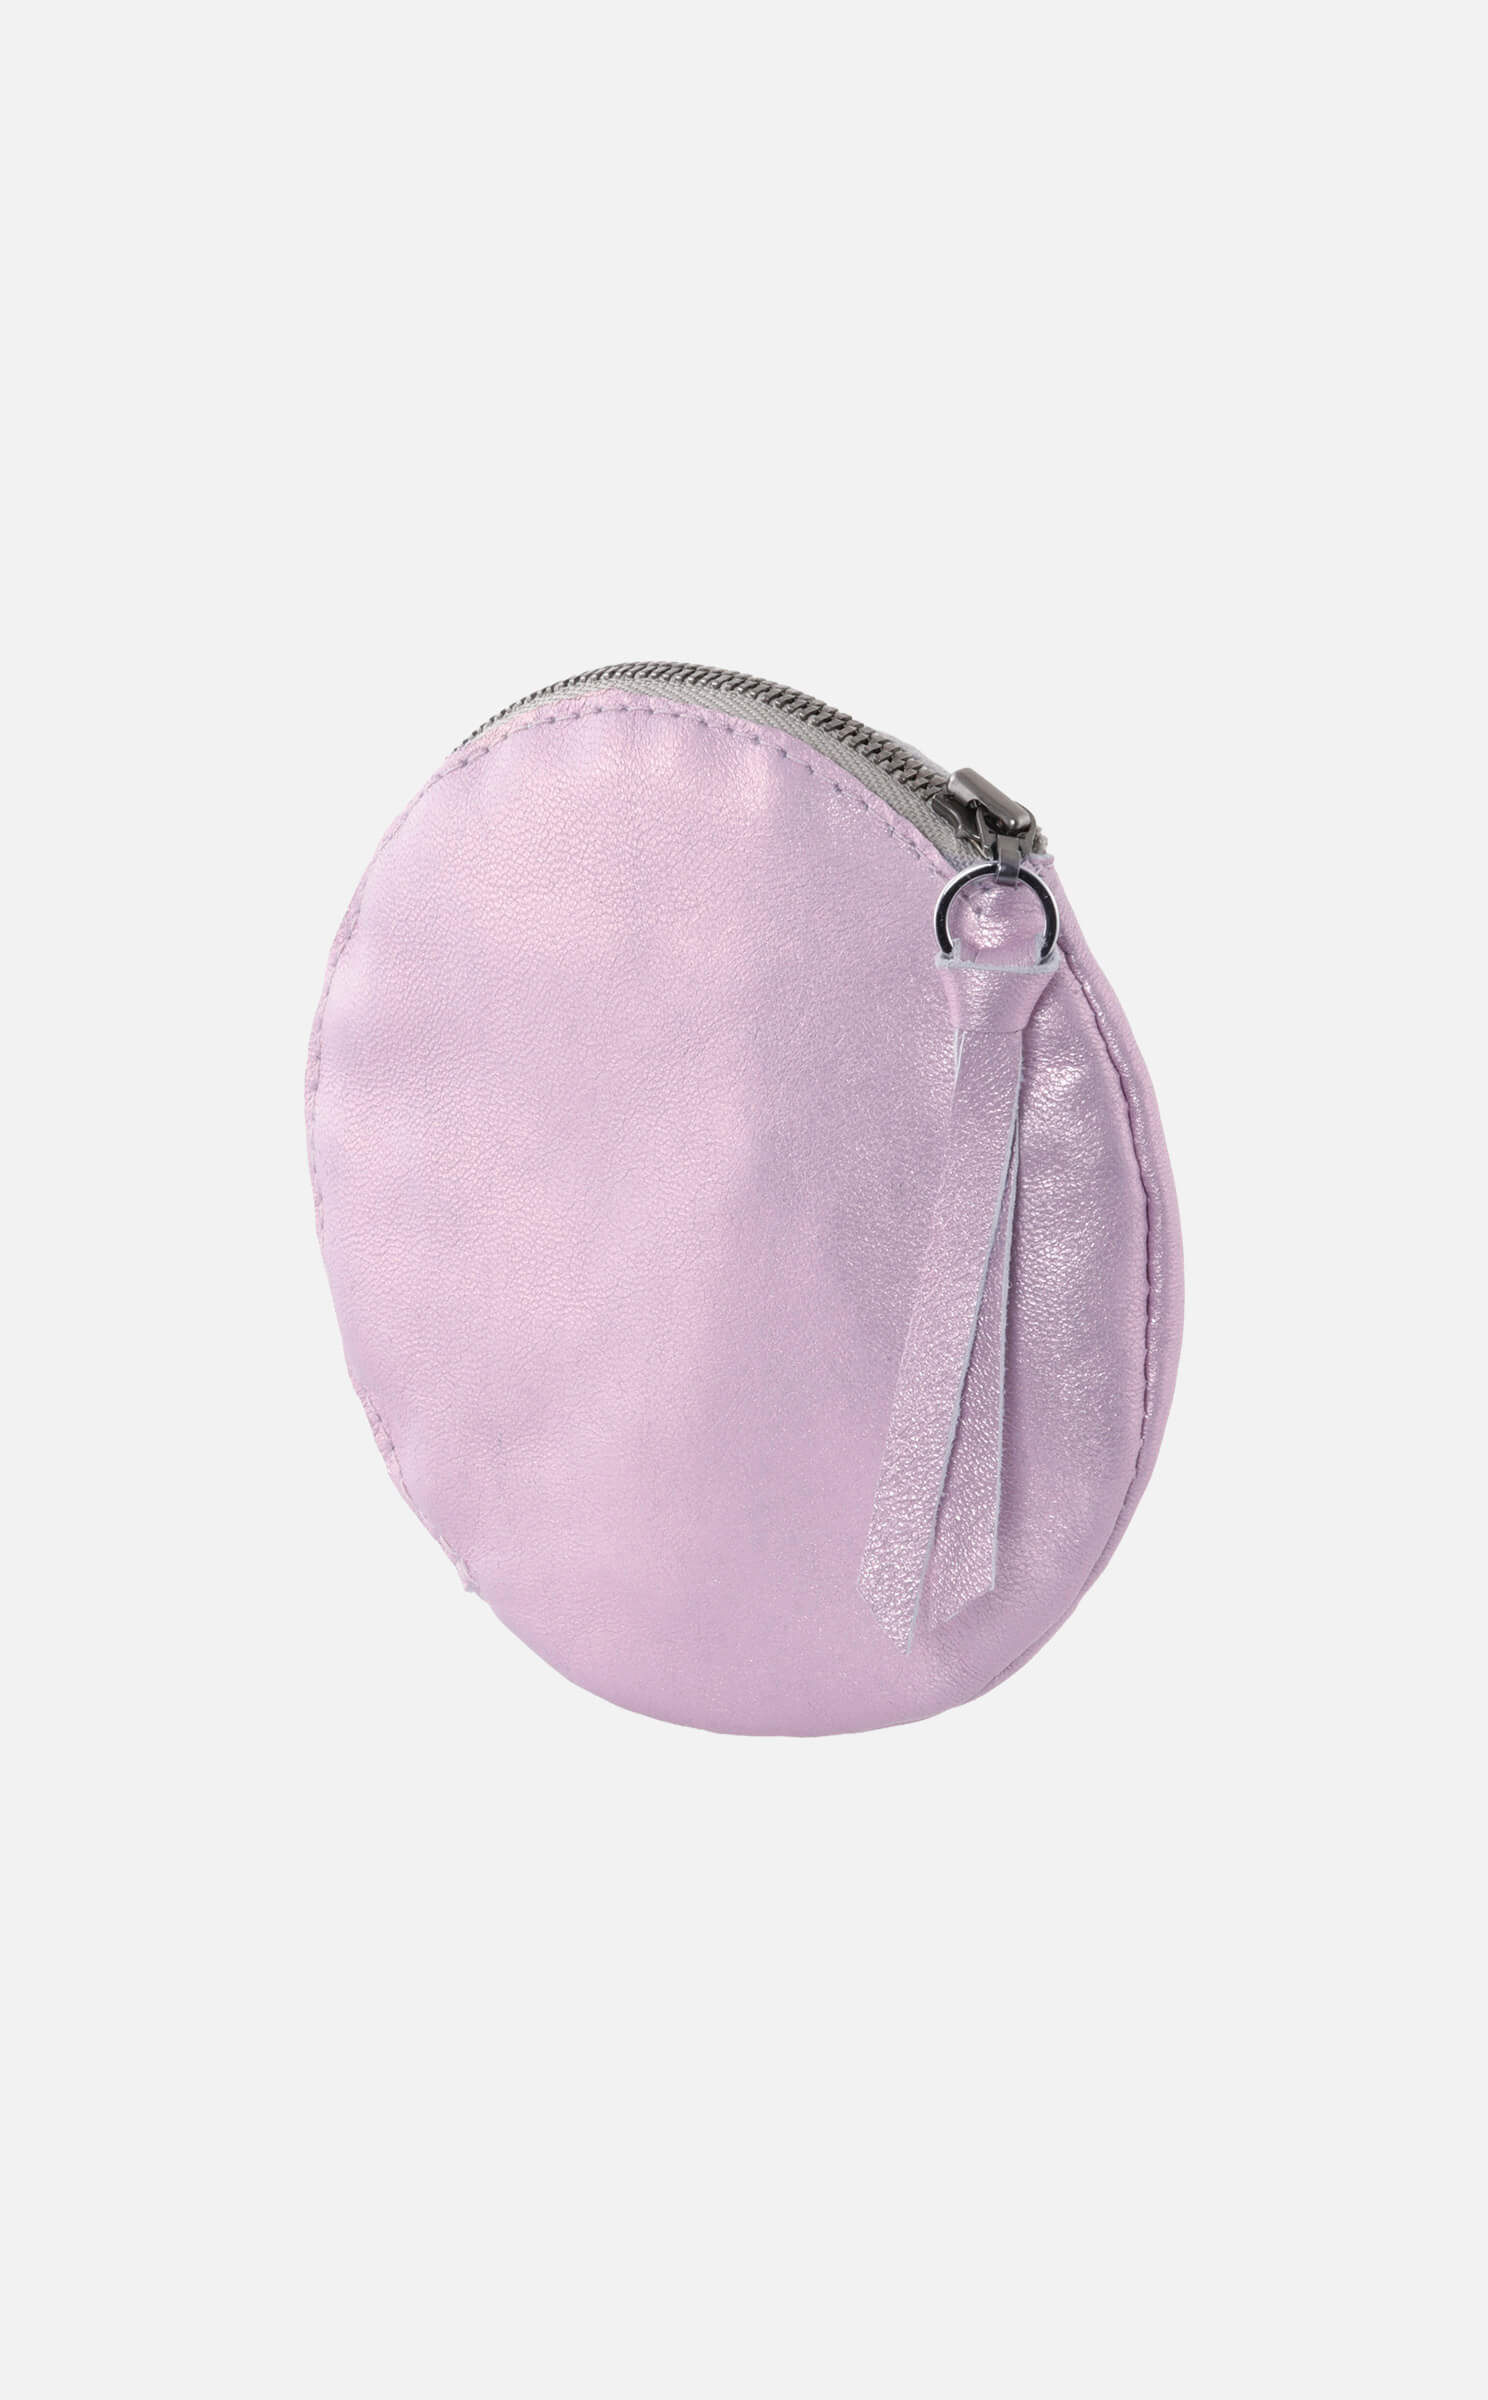 Bezauberndes rundes Lederetui, metallic rosa